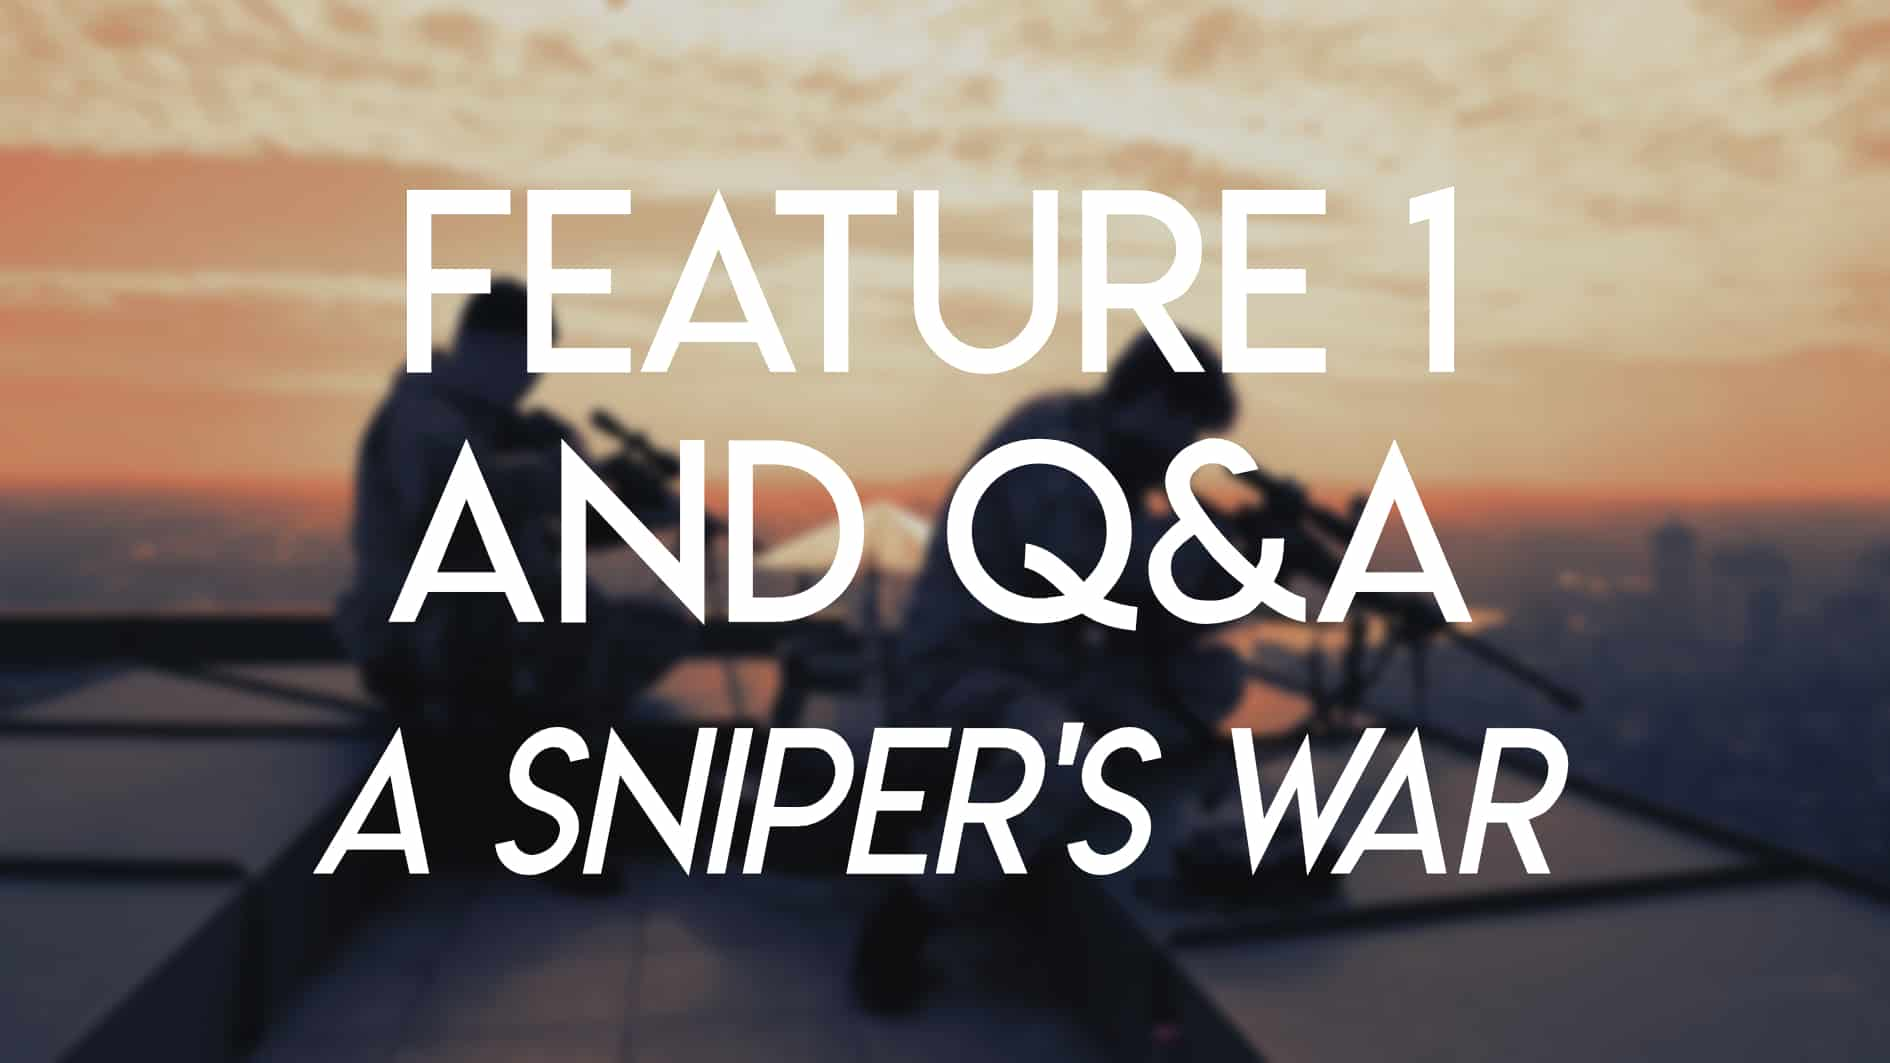 New York Lift-Off Film Festival 2018 - feature - A Sniper's War